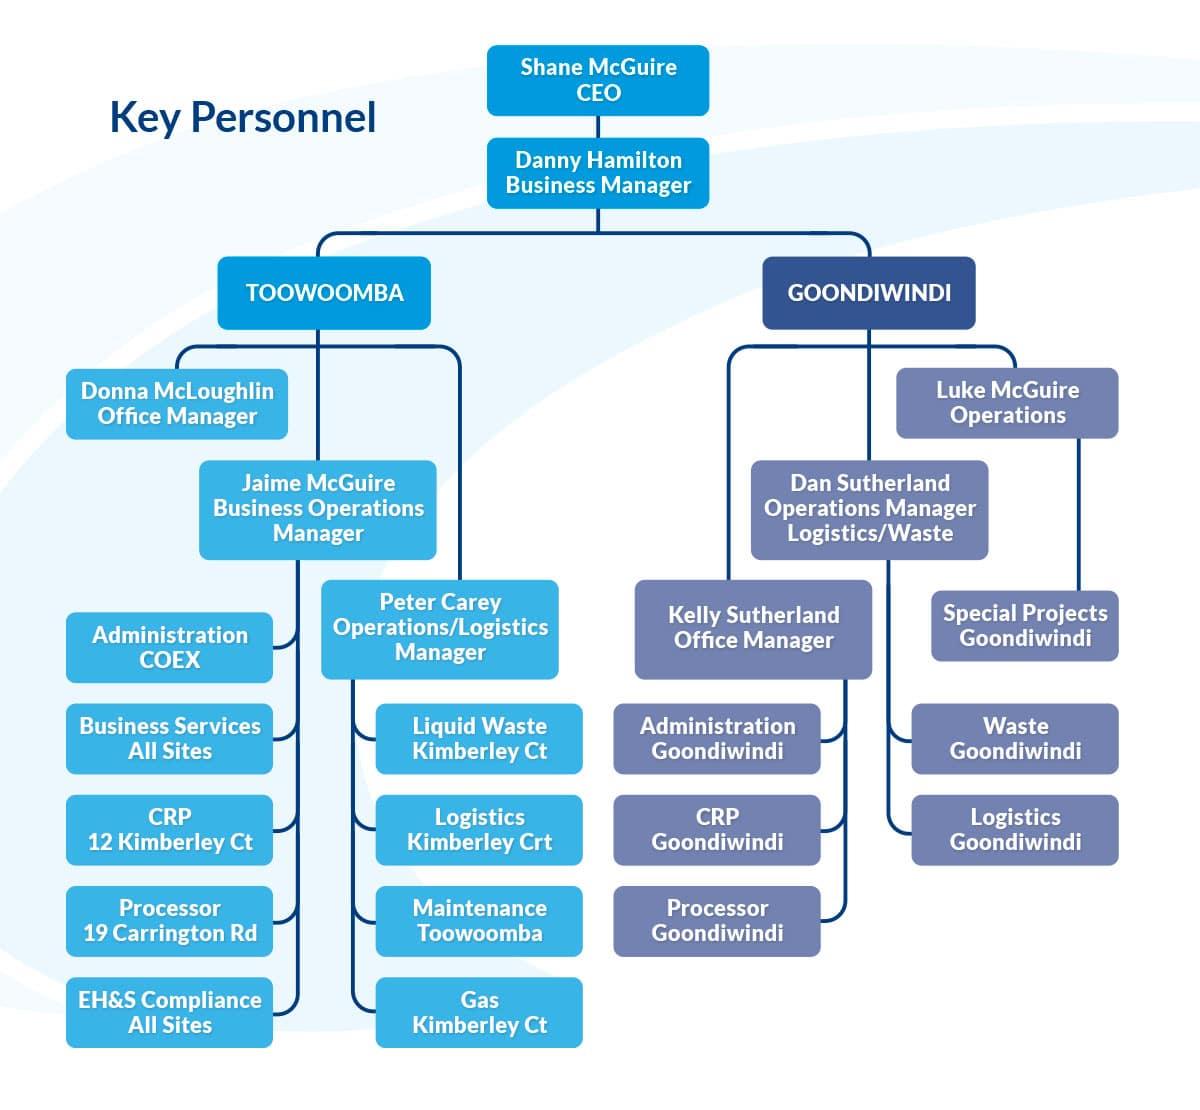 E&E Waste-Personnel-Flowchart